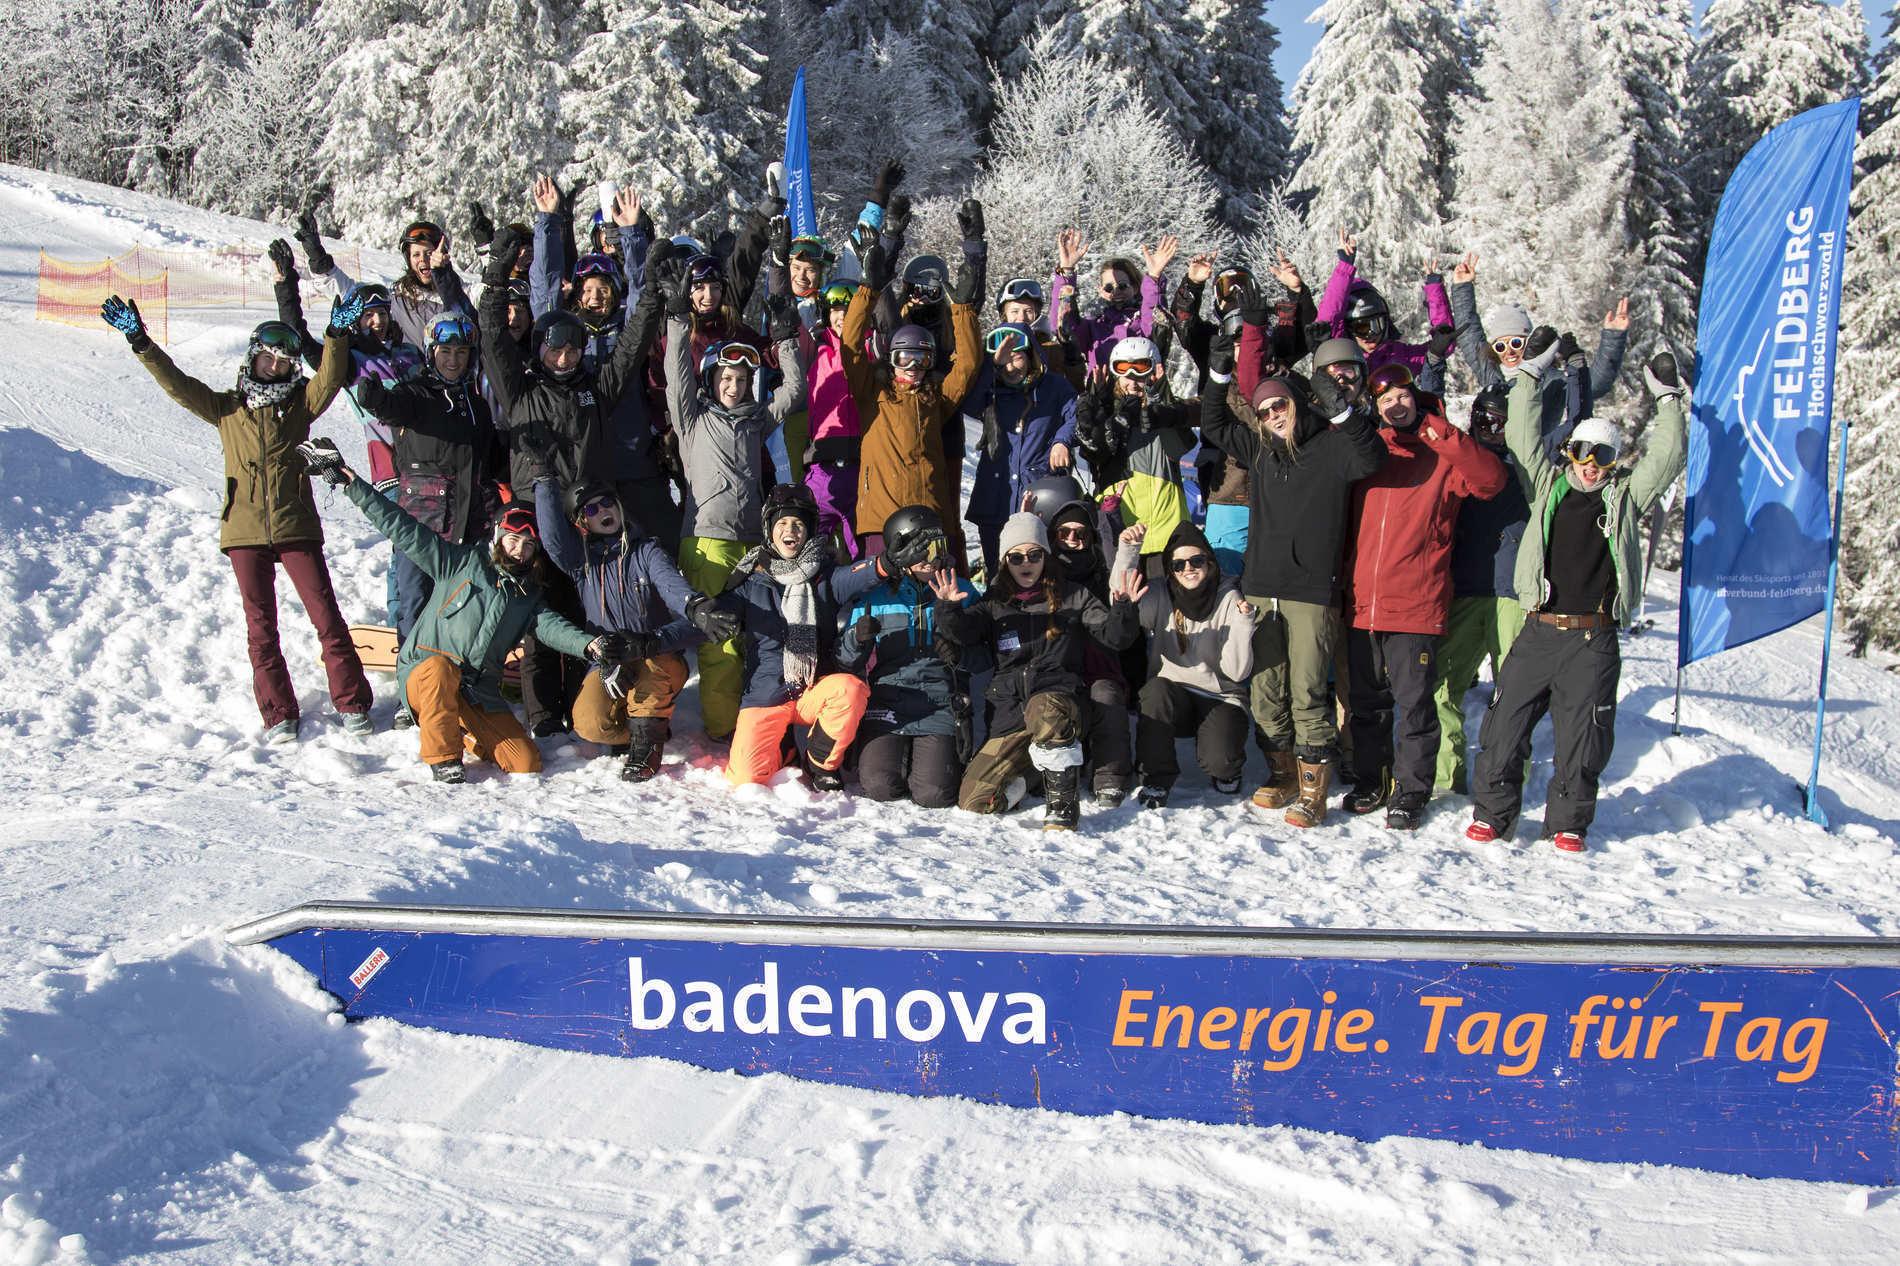 web snowpark feldberg 24 02 2018 lifestyle fs sb martin herrmann qparks 5